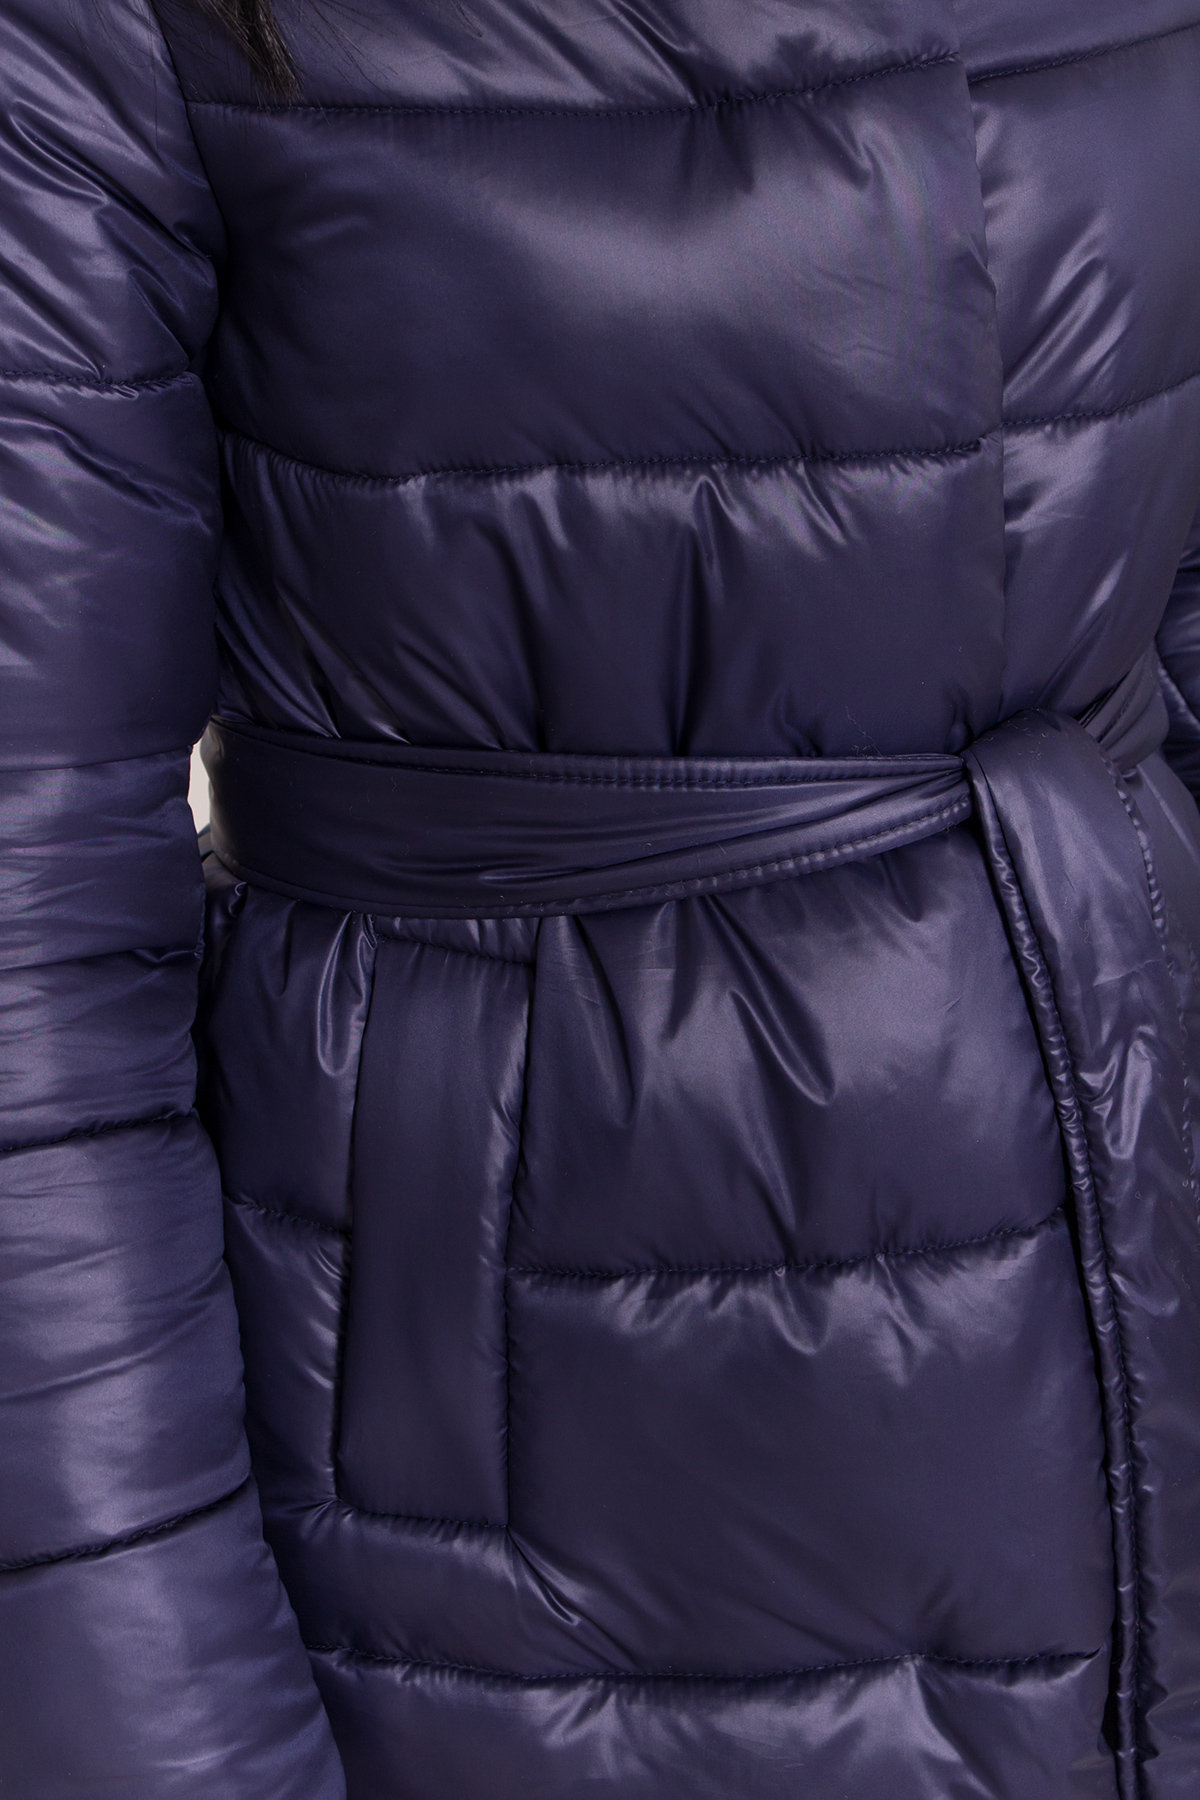 Длинная зимняя куртка-пуховик Сигма 8040 АРТ. 43989 Цвет: Т.синий - фото 5, интернет магазин tm-modus.ru